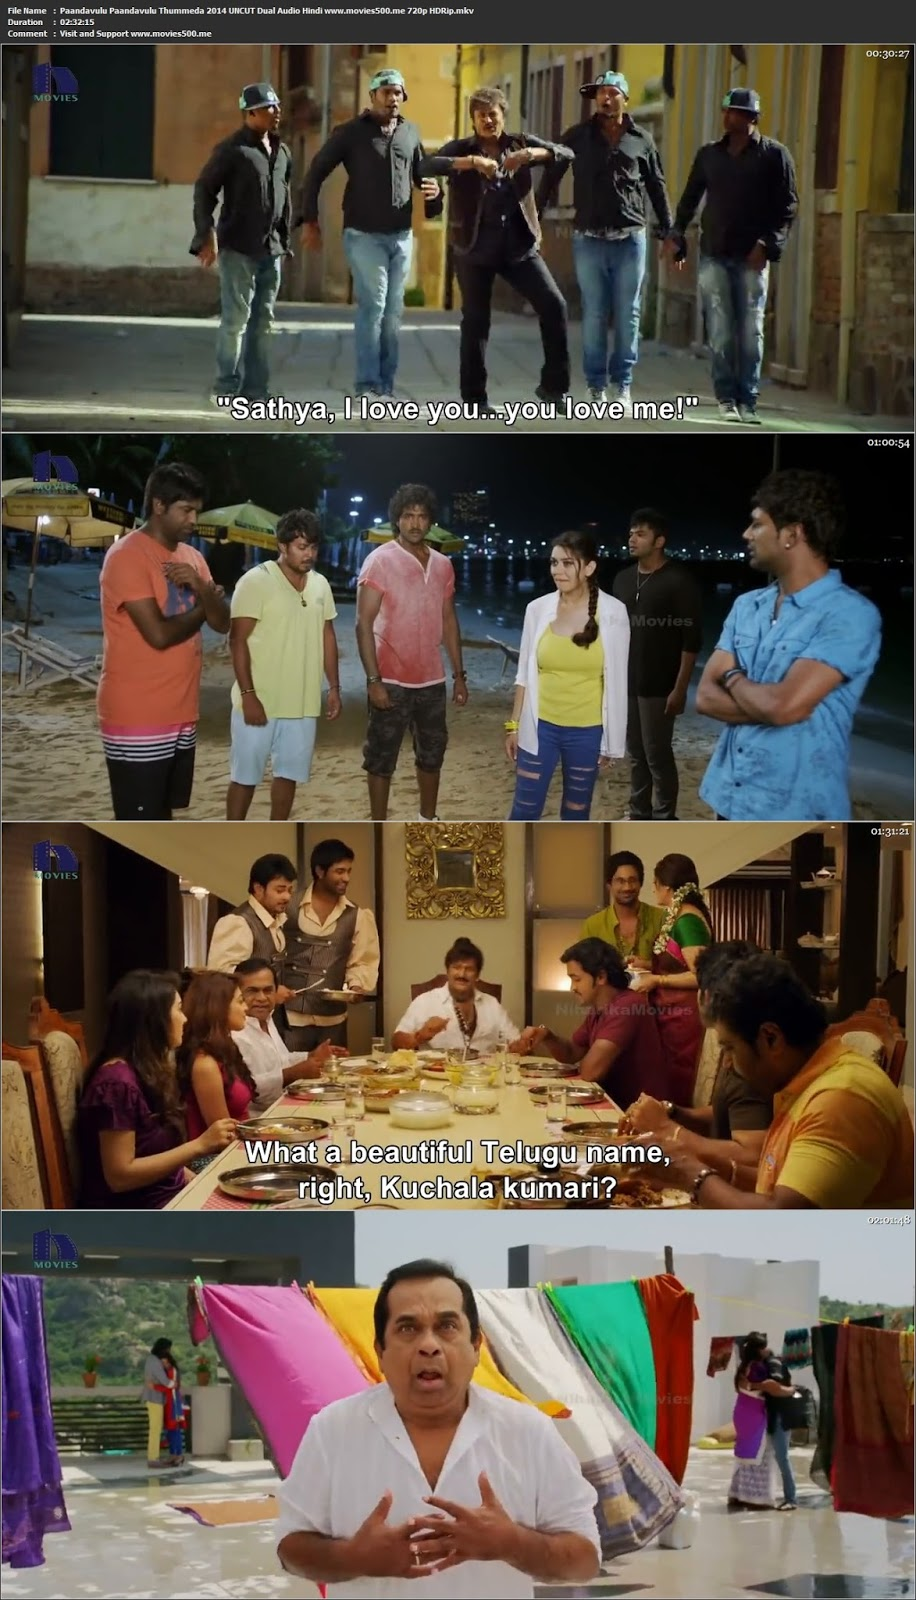 Paandavulu Paandavulu Thummeda 2014 UNCUT Dual Audio Hindi HDRip 720p at freedomcopy.com